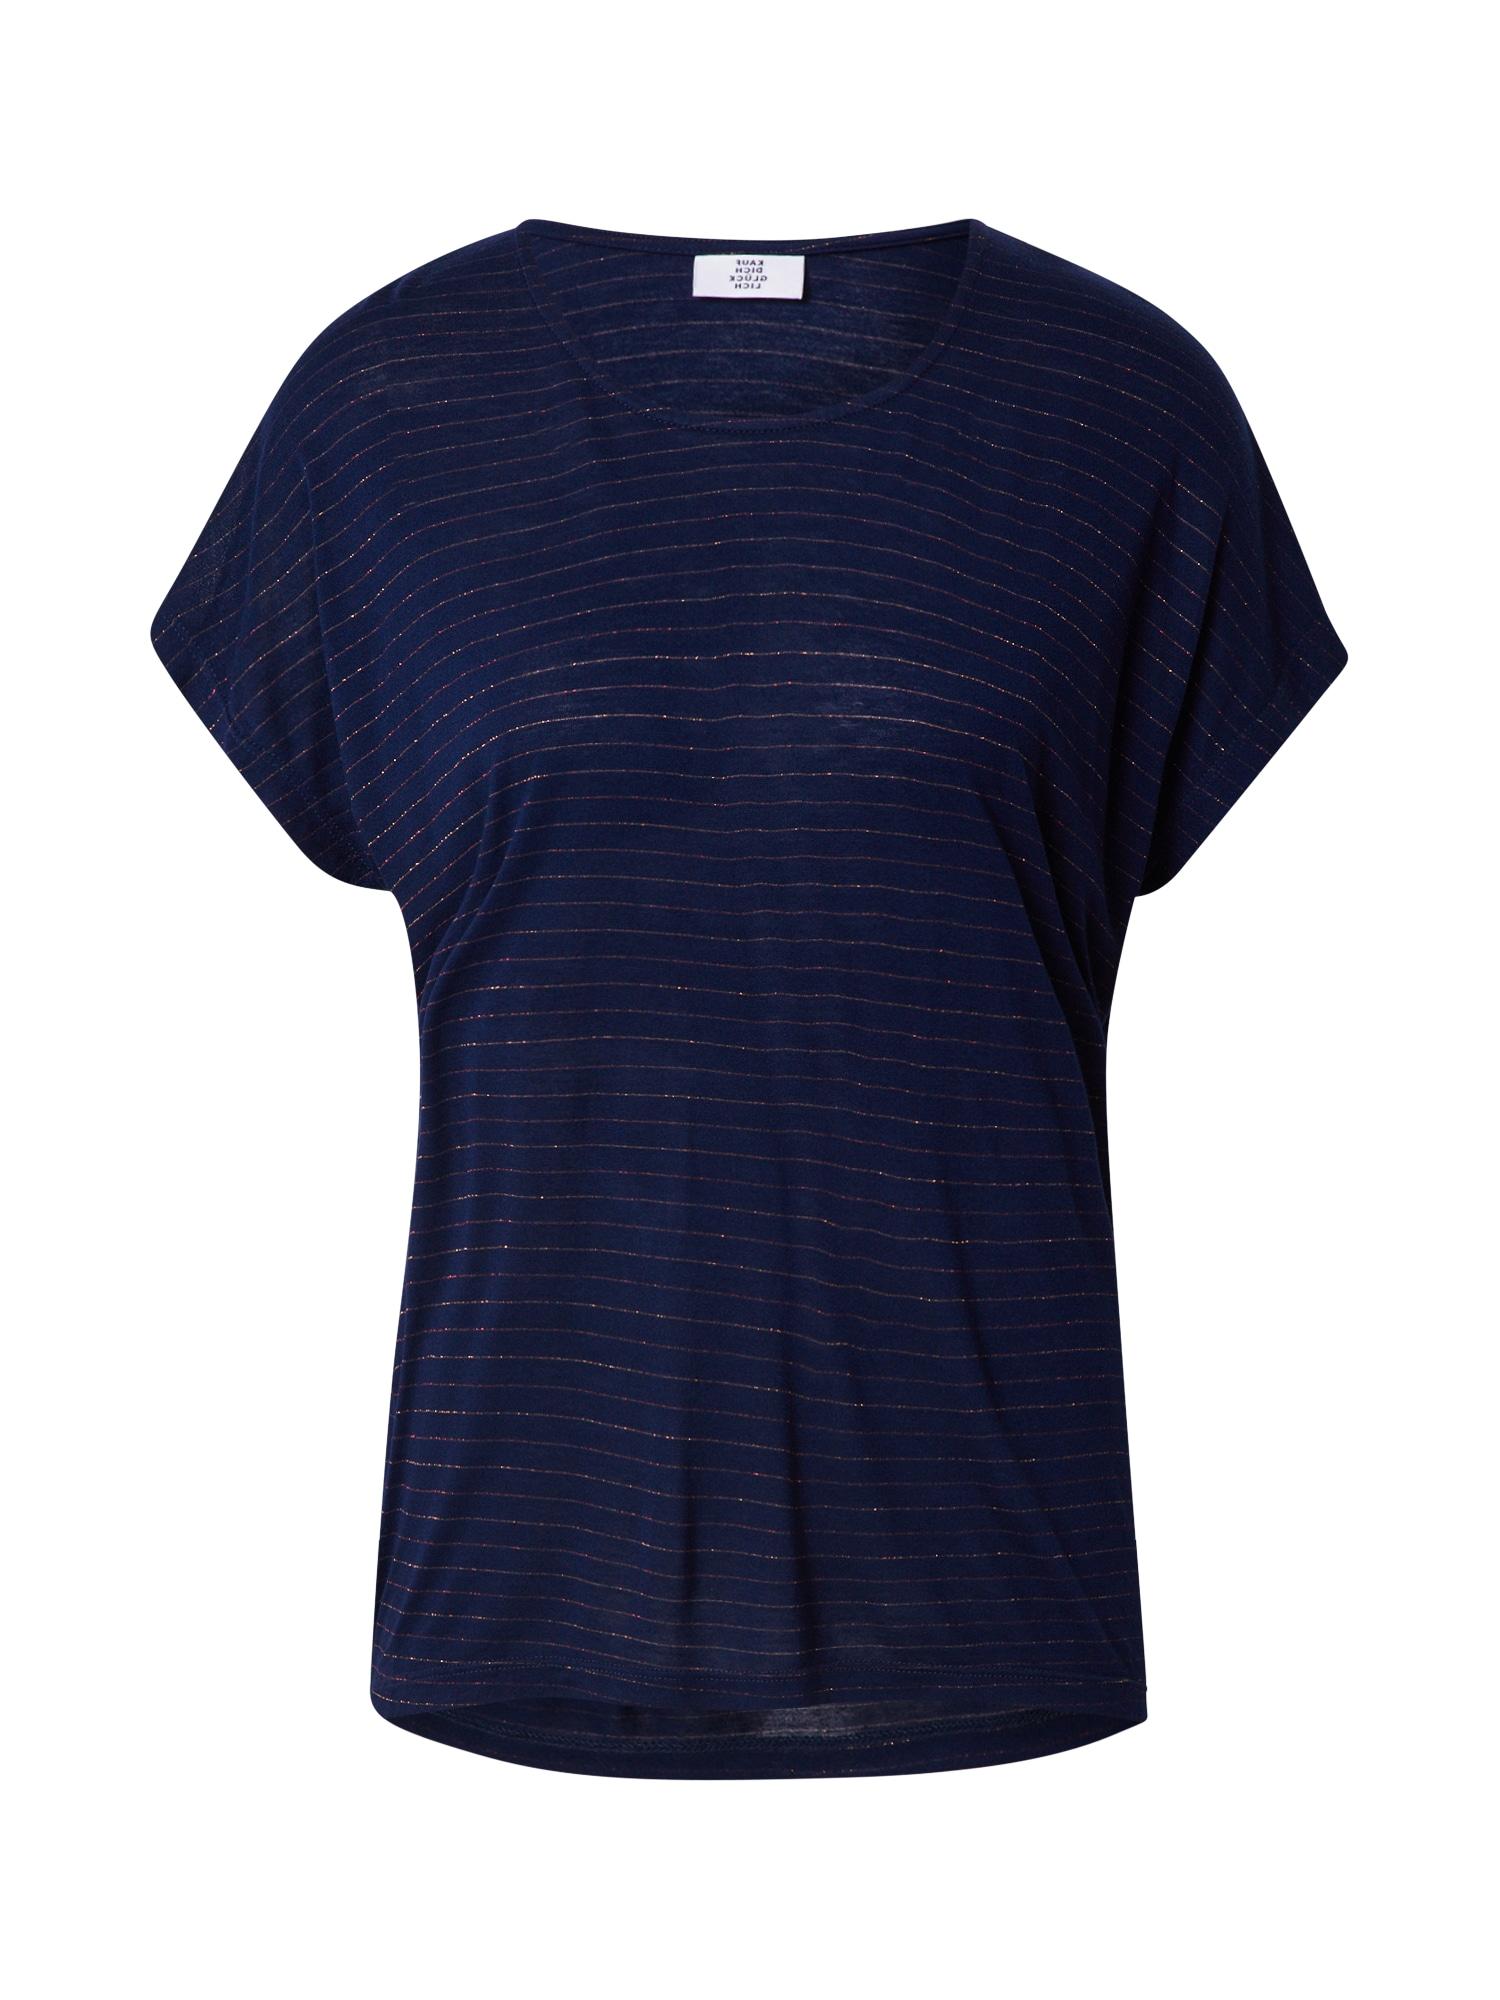 Kauf Dich Glücklich Marškinėliai tamsiai mėlyna / auksas